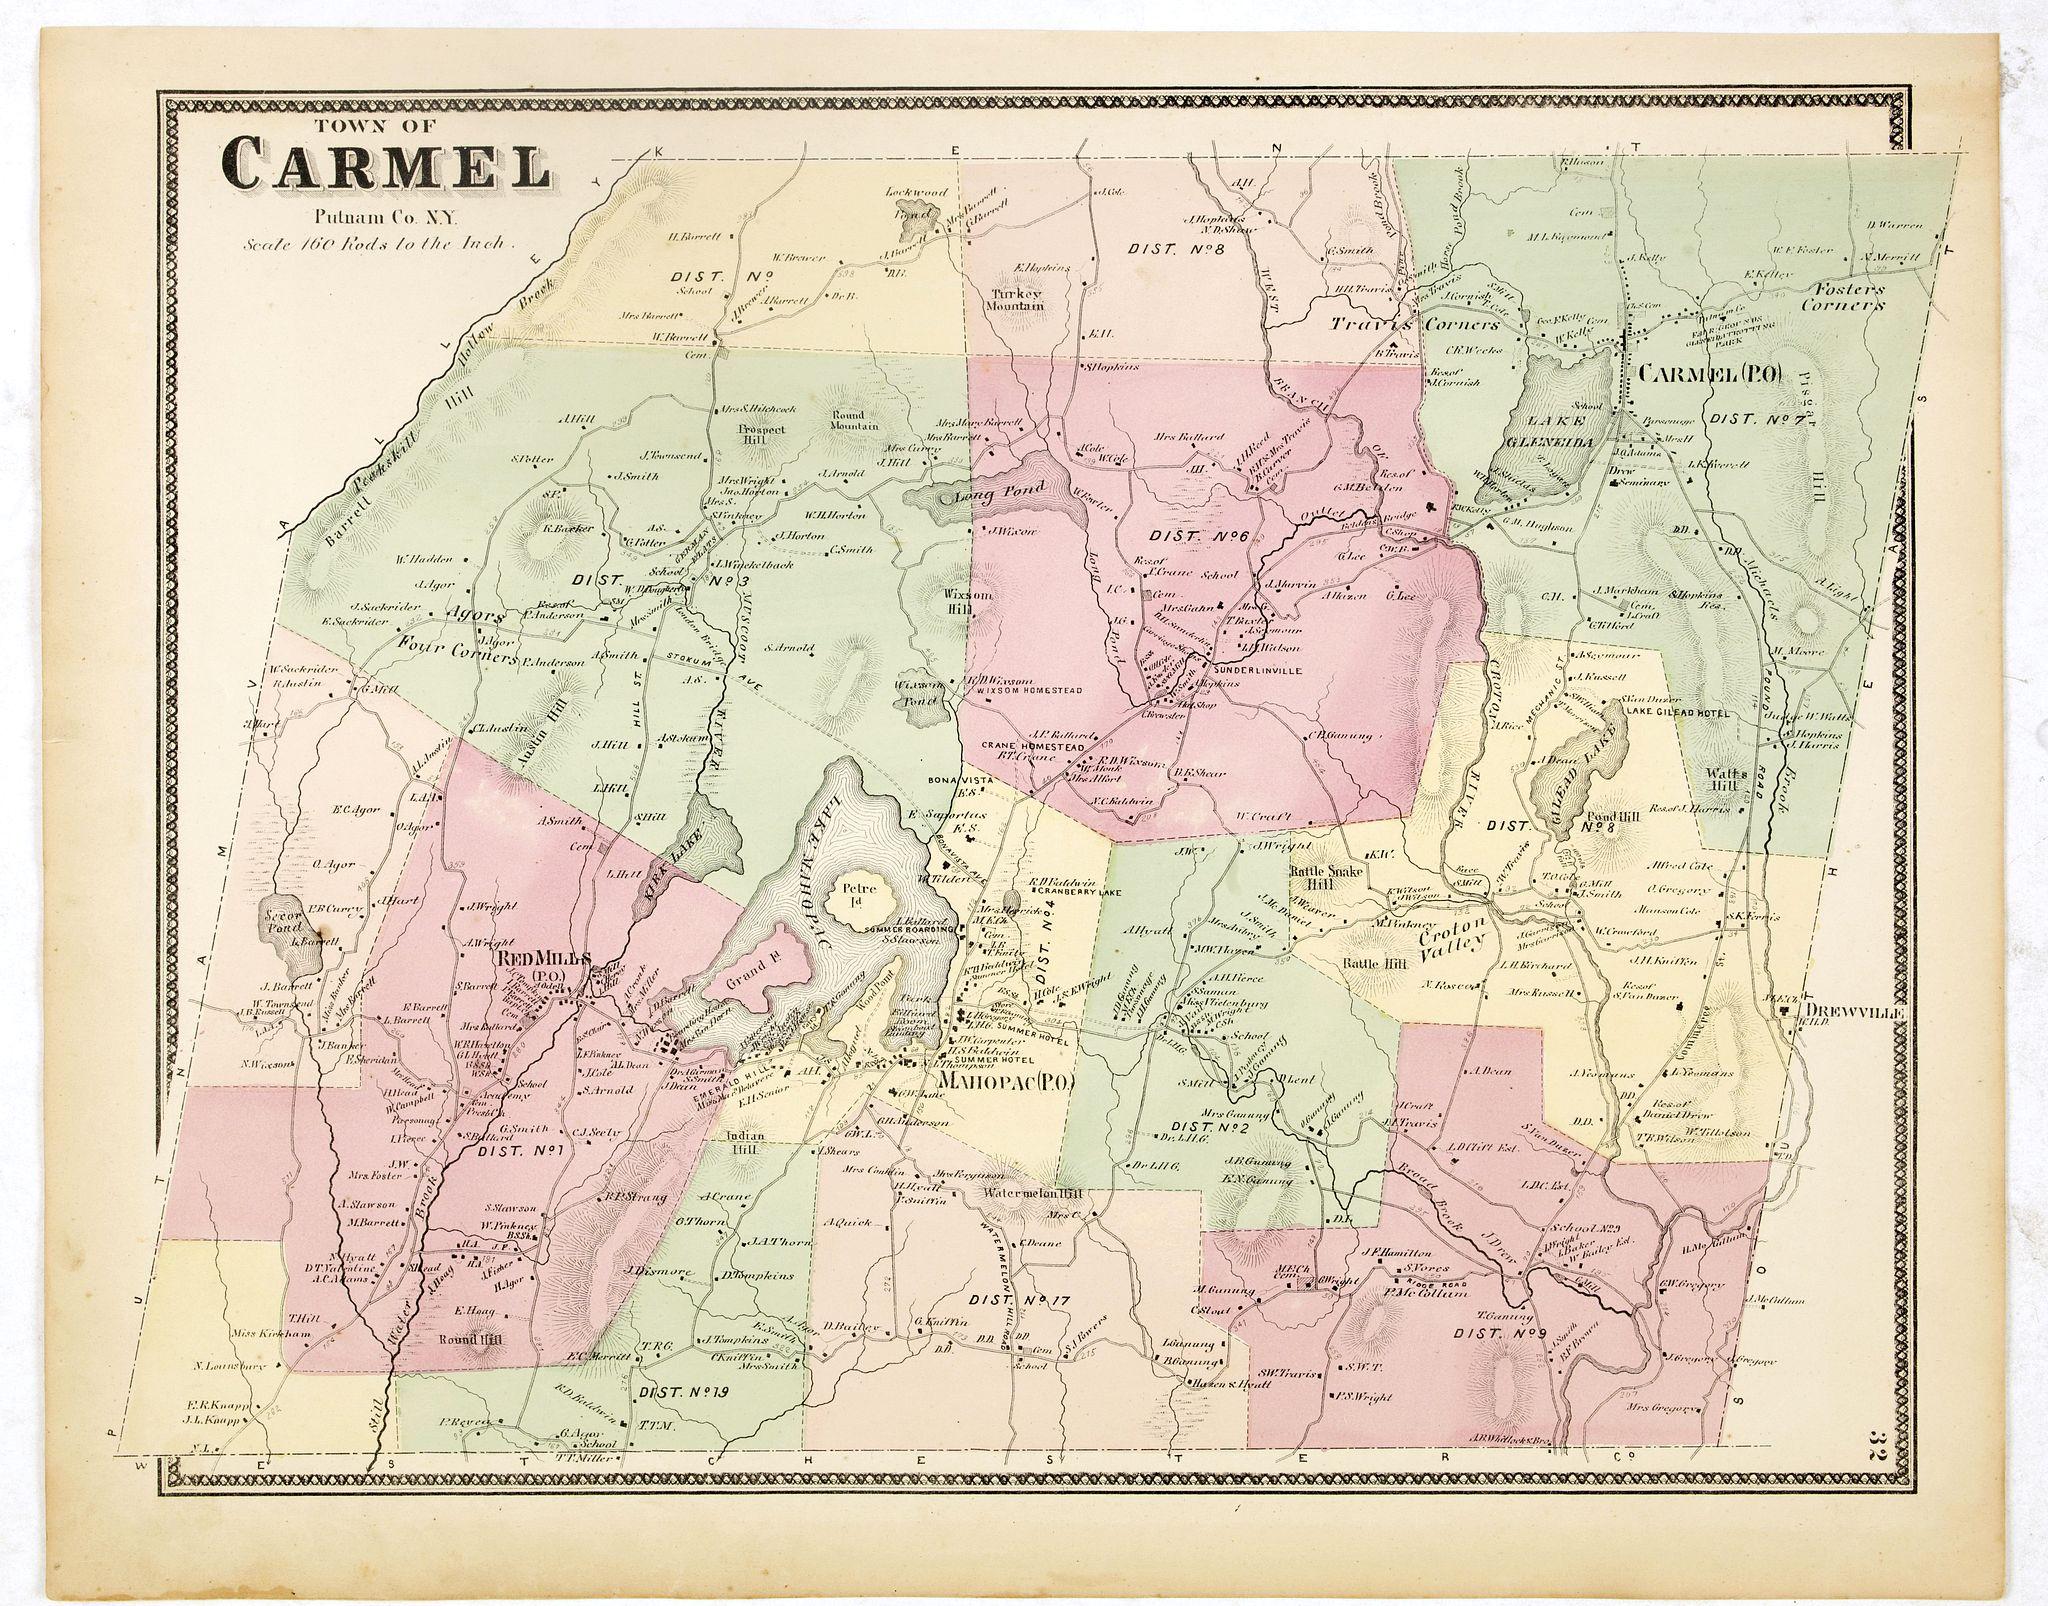 DE BEERS, F.W. -  Town of Carmel.